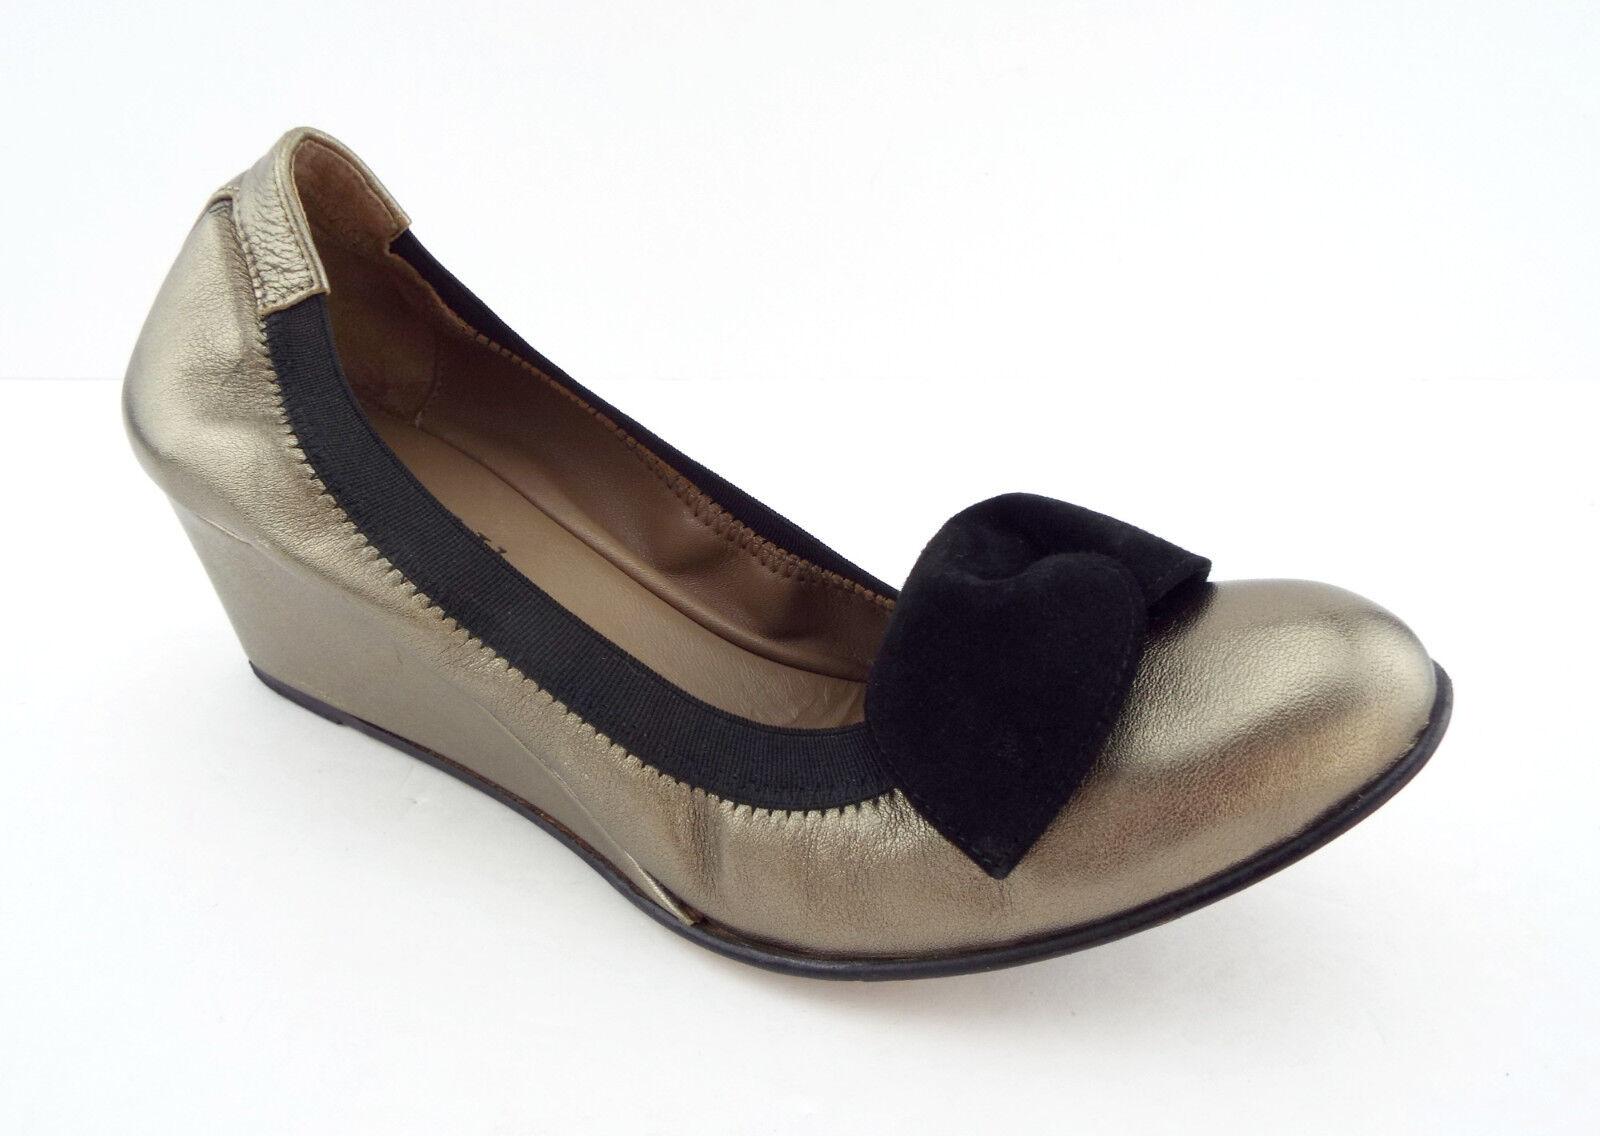 ANYI LU Size 8.5 ROSIE Pewter Metallic Wedge Ballet Flats shoes w  Bow 39